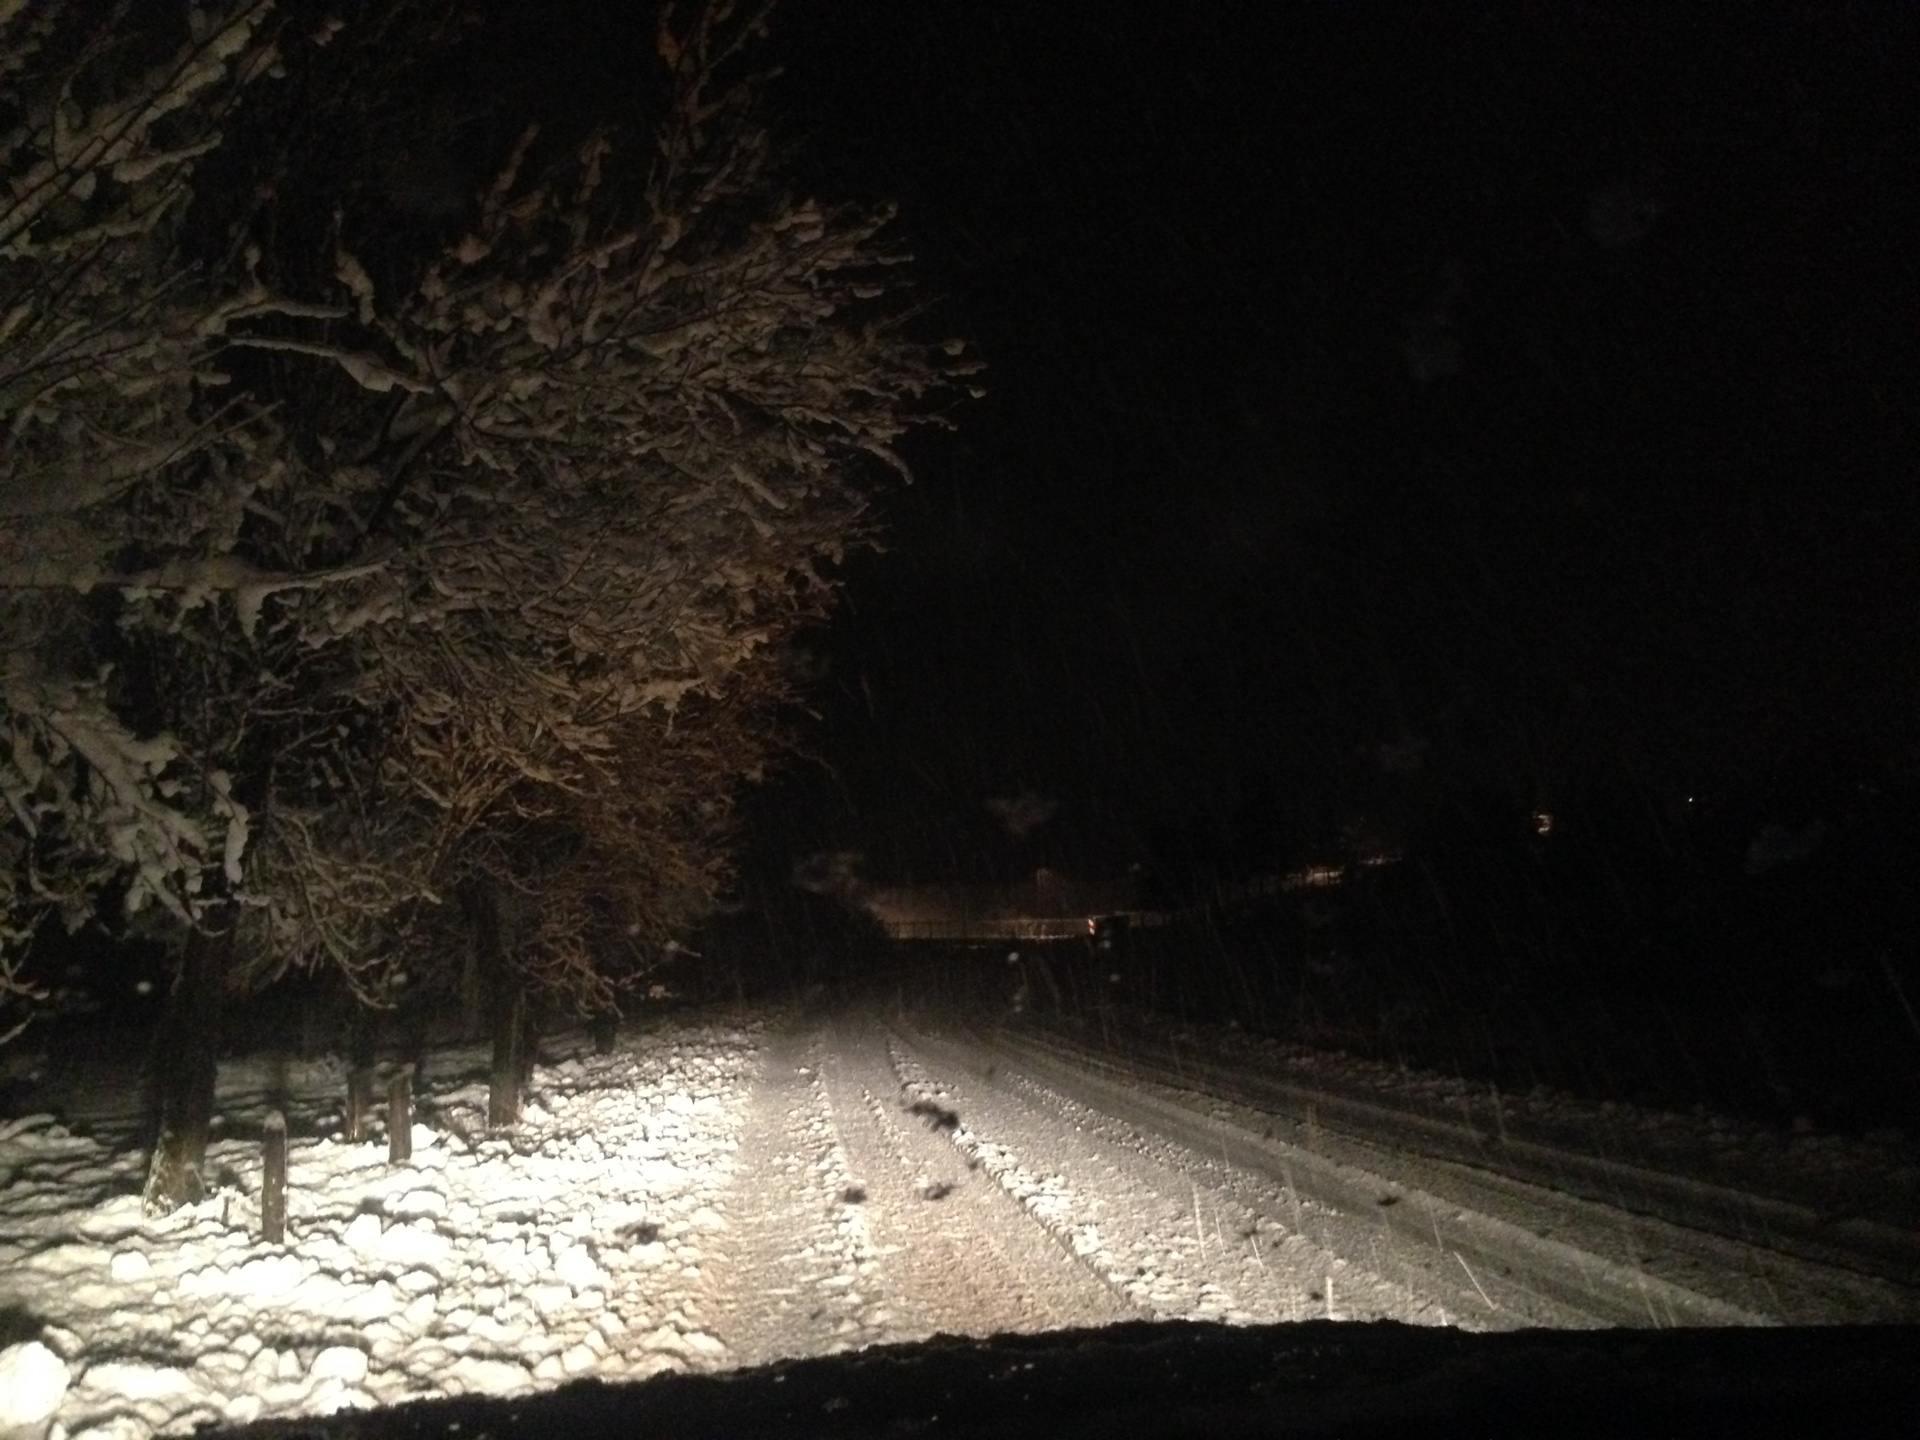 The dramatic Croatian snowstorm.